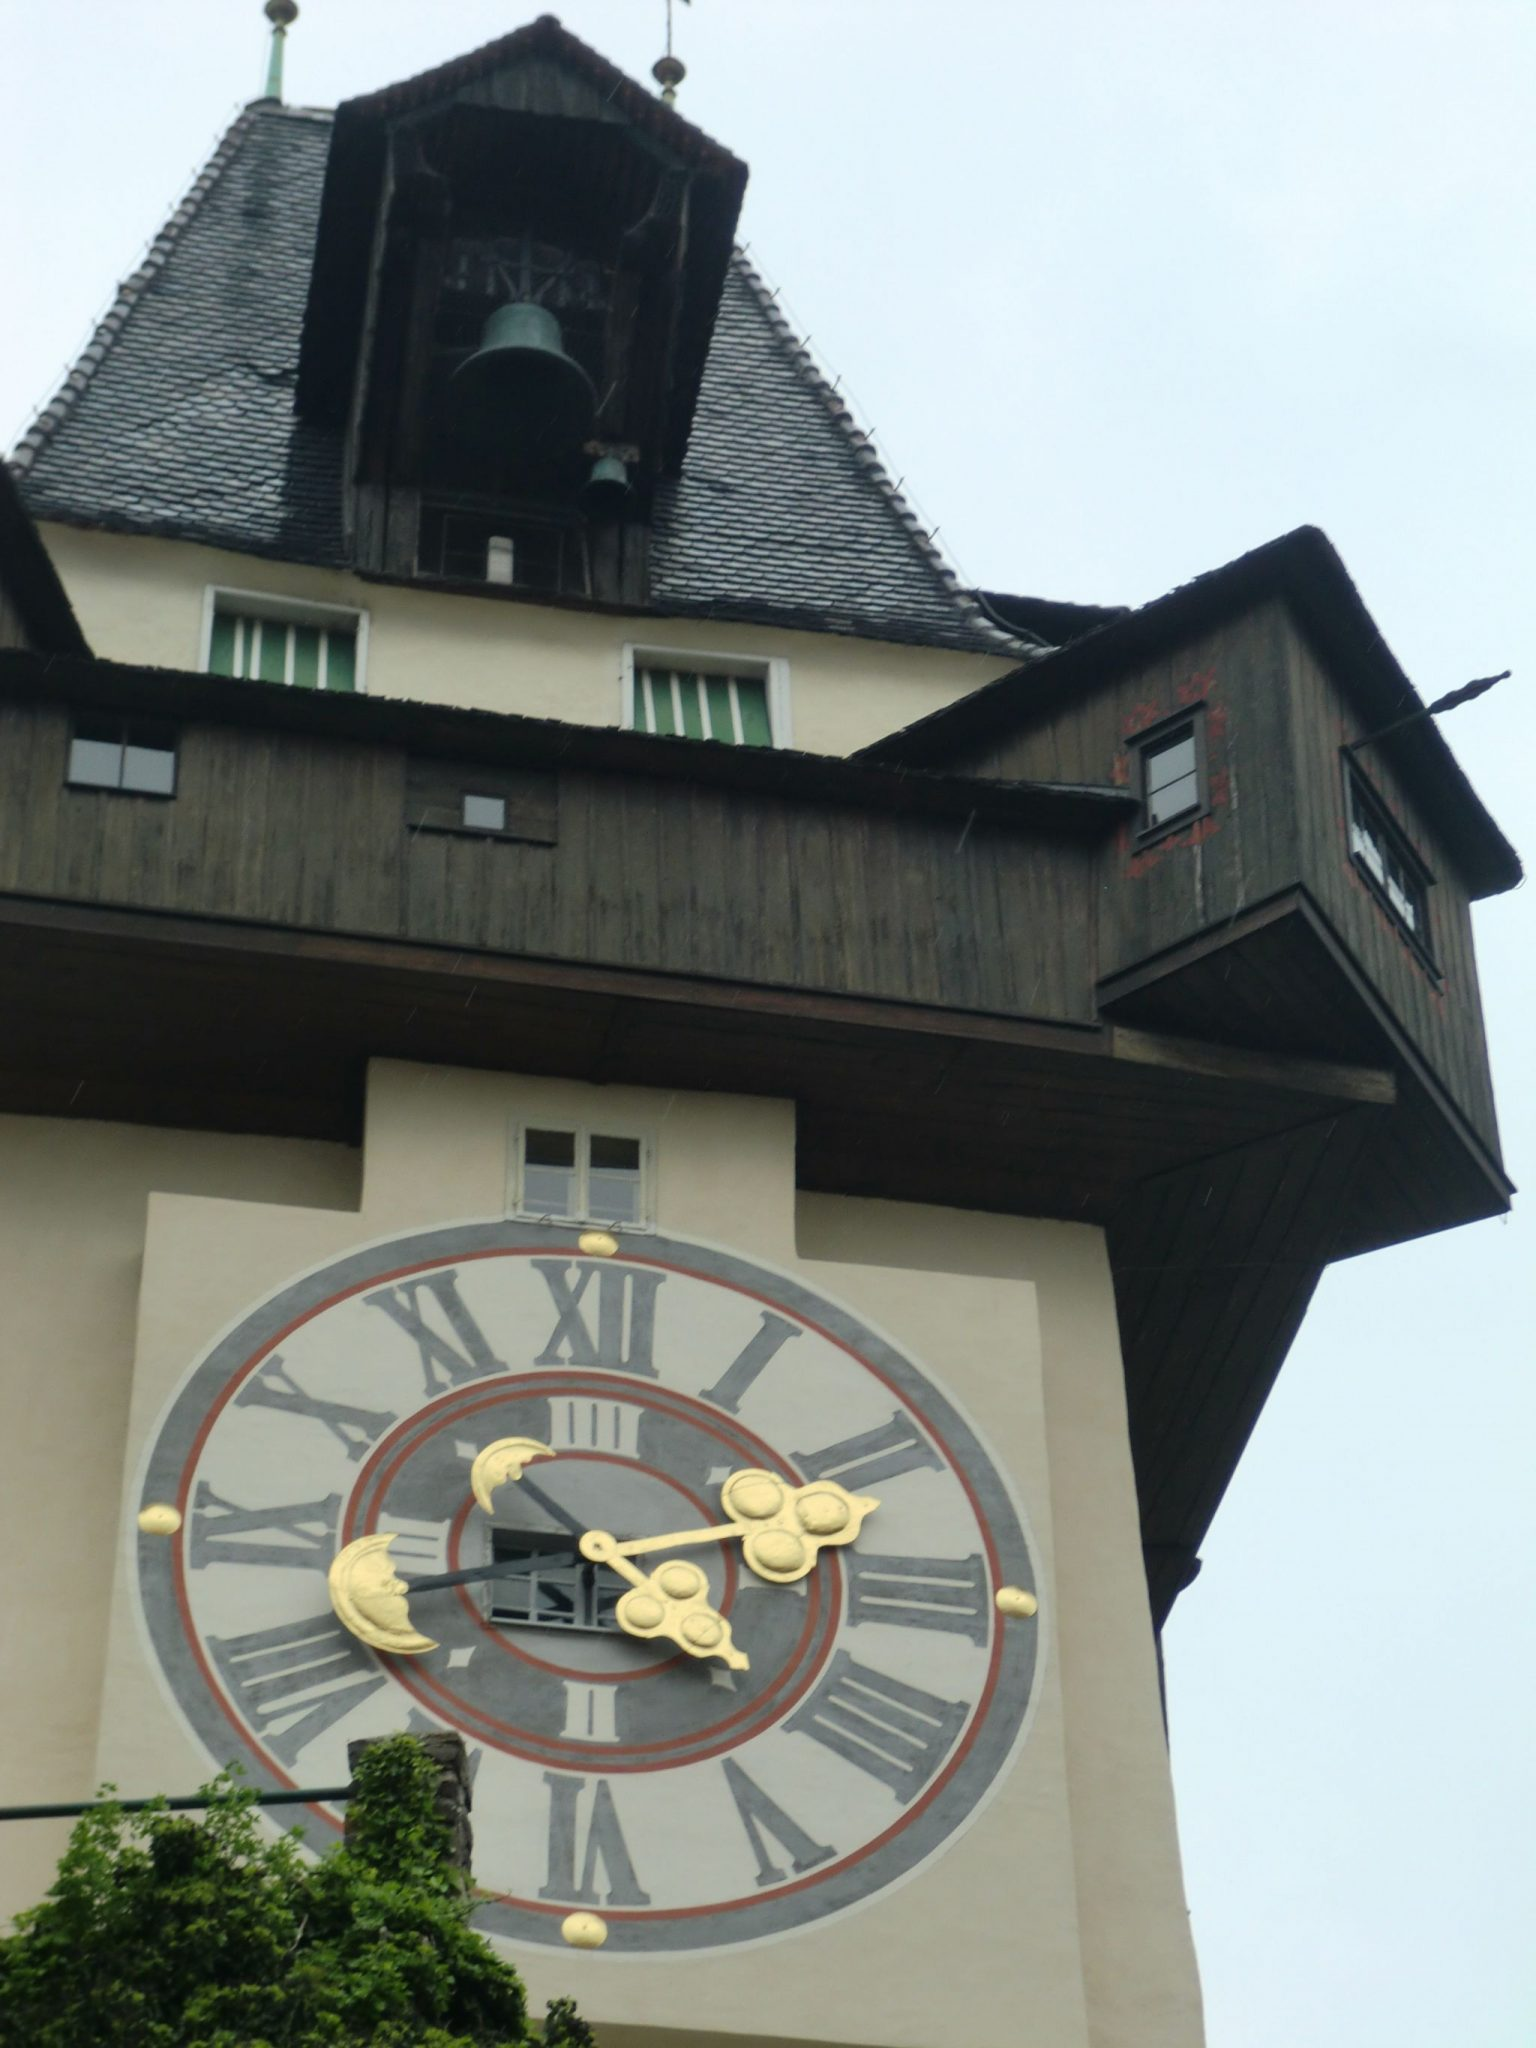 Graz clock tower 1 - Graz: tradition and modernity